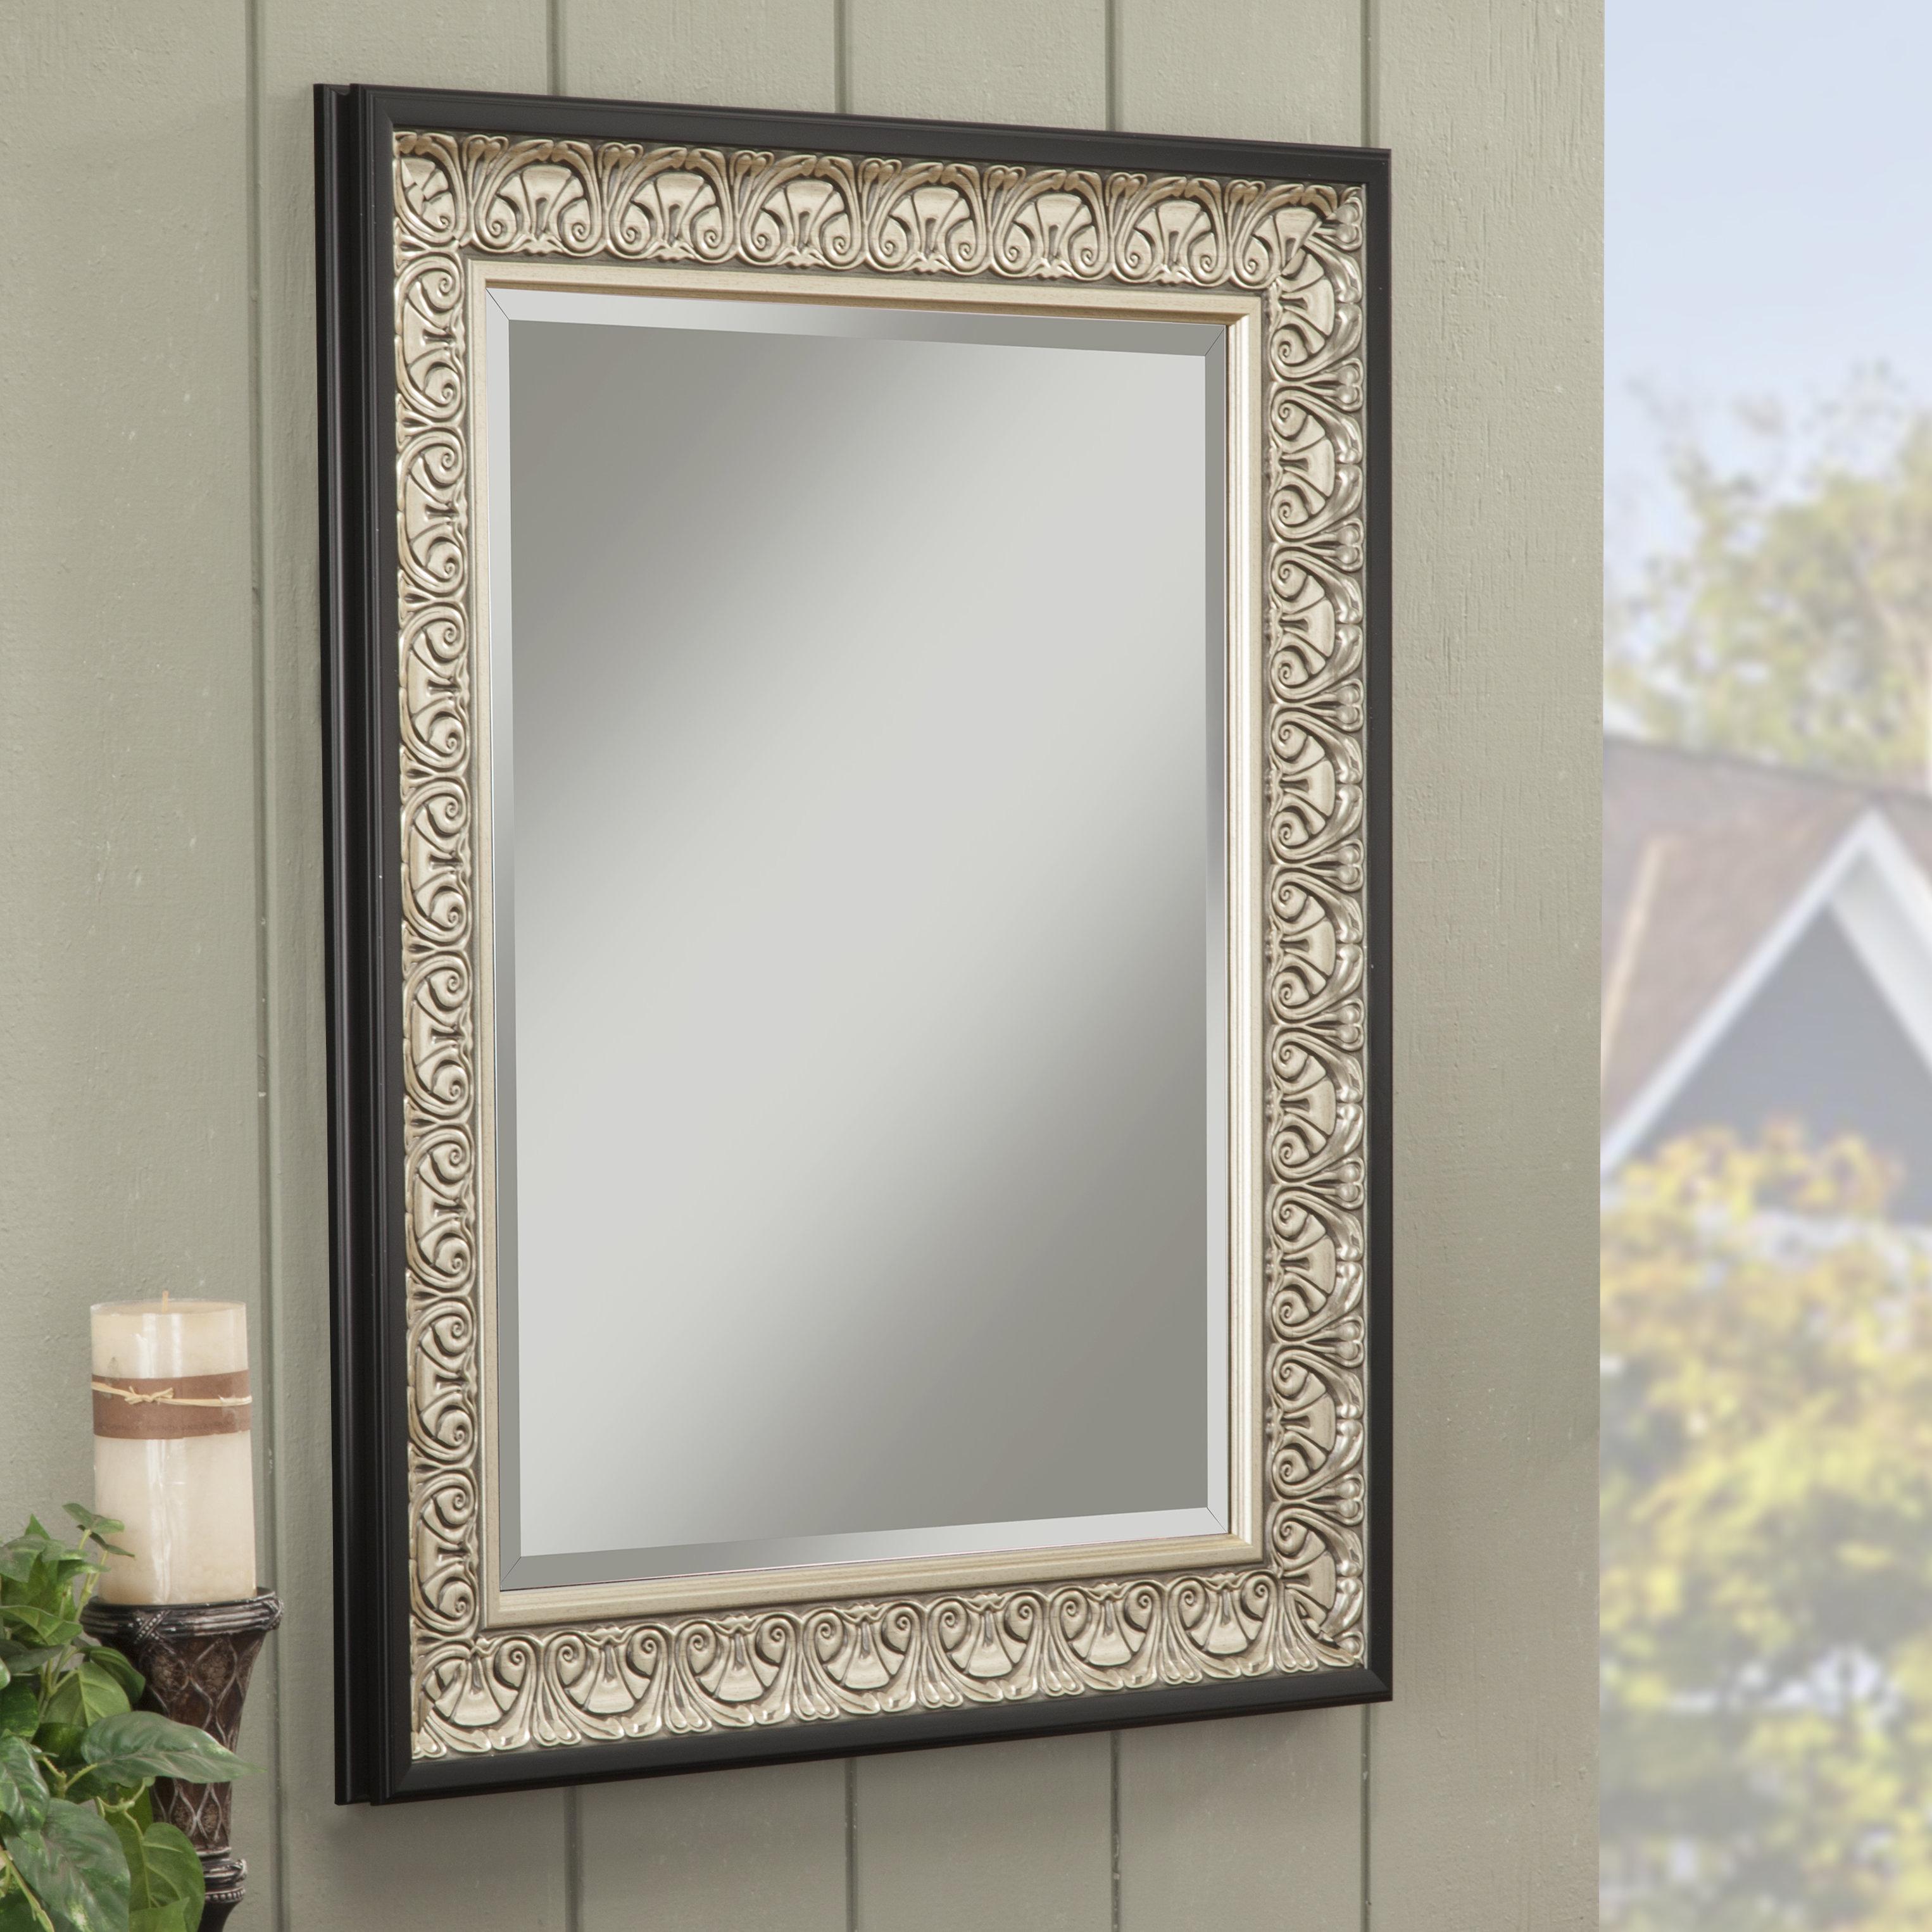 Boyers Wall Mirror Regarding Boyers Wall Mirrors (Image 4 of 20)